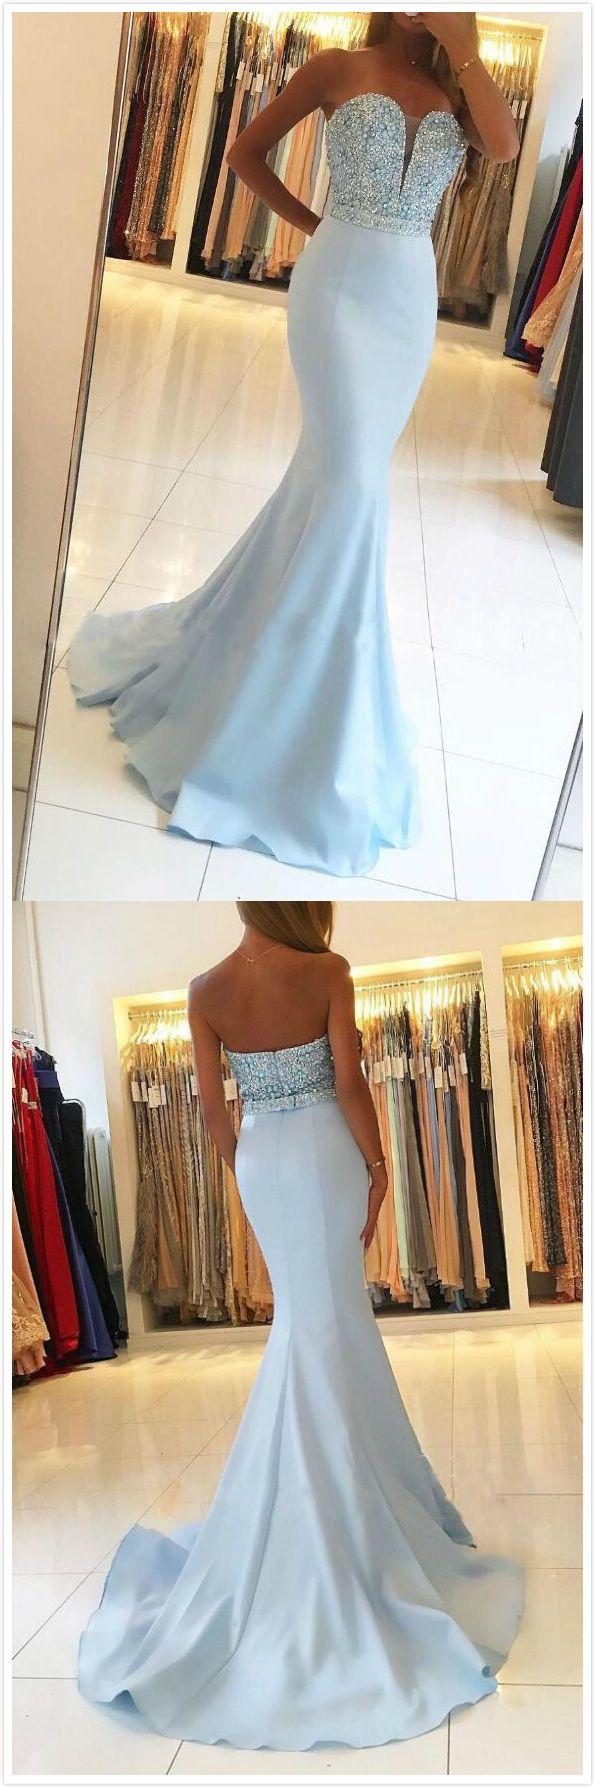 Sweetheart Neck Prom Dresses,Cheap Prom Dress,Strapless Prom Dress,Beaded